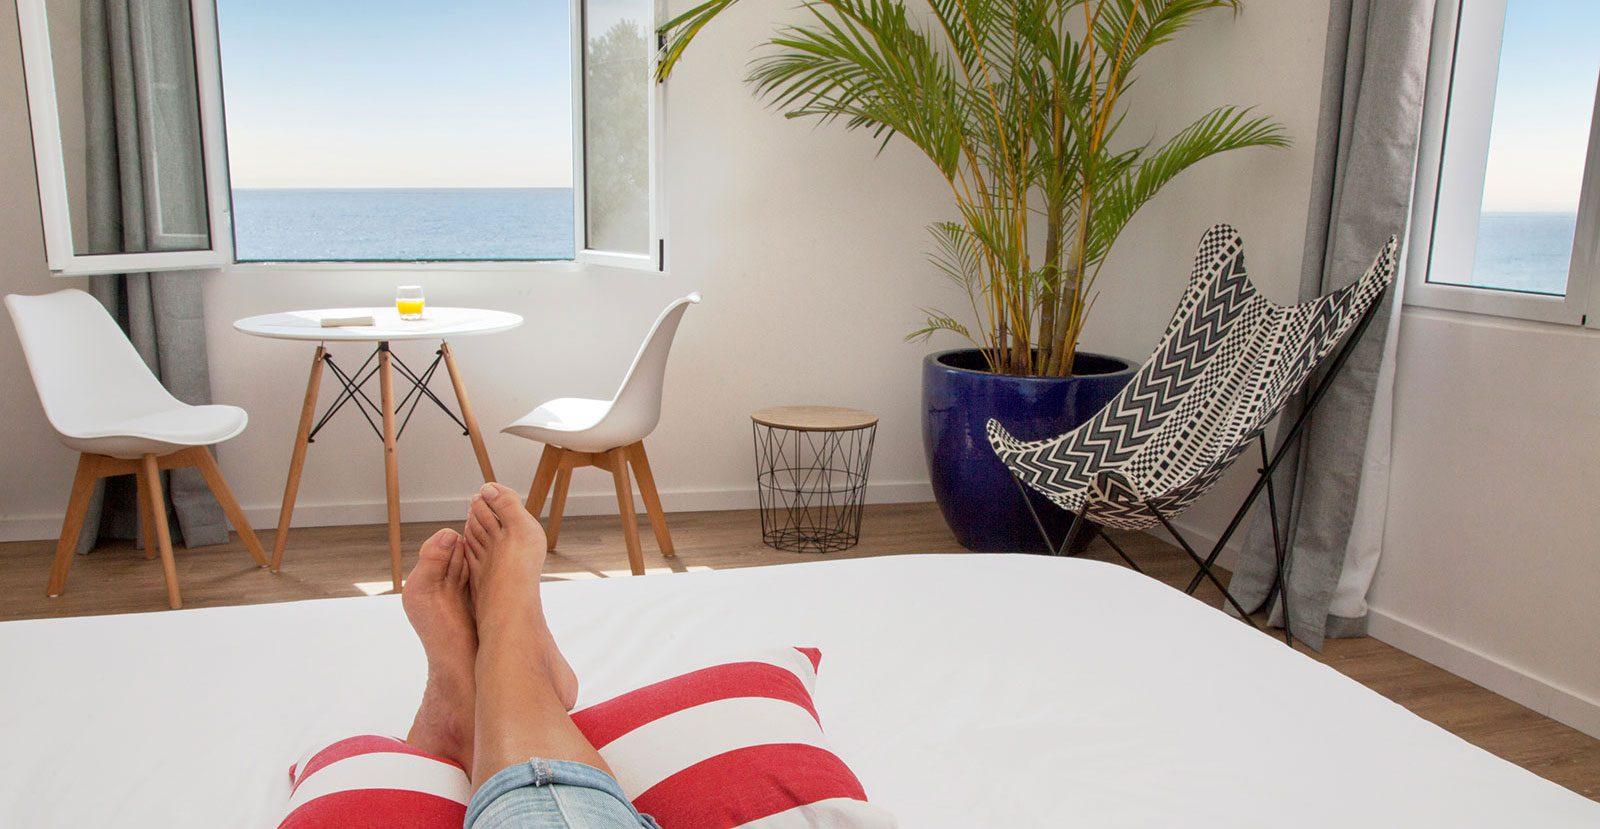 Villa Sal Azores Stays bedroom relaxing with ocean view